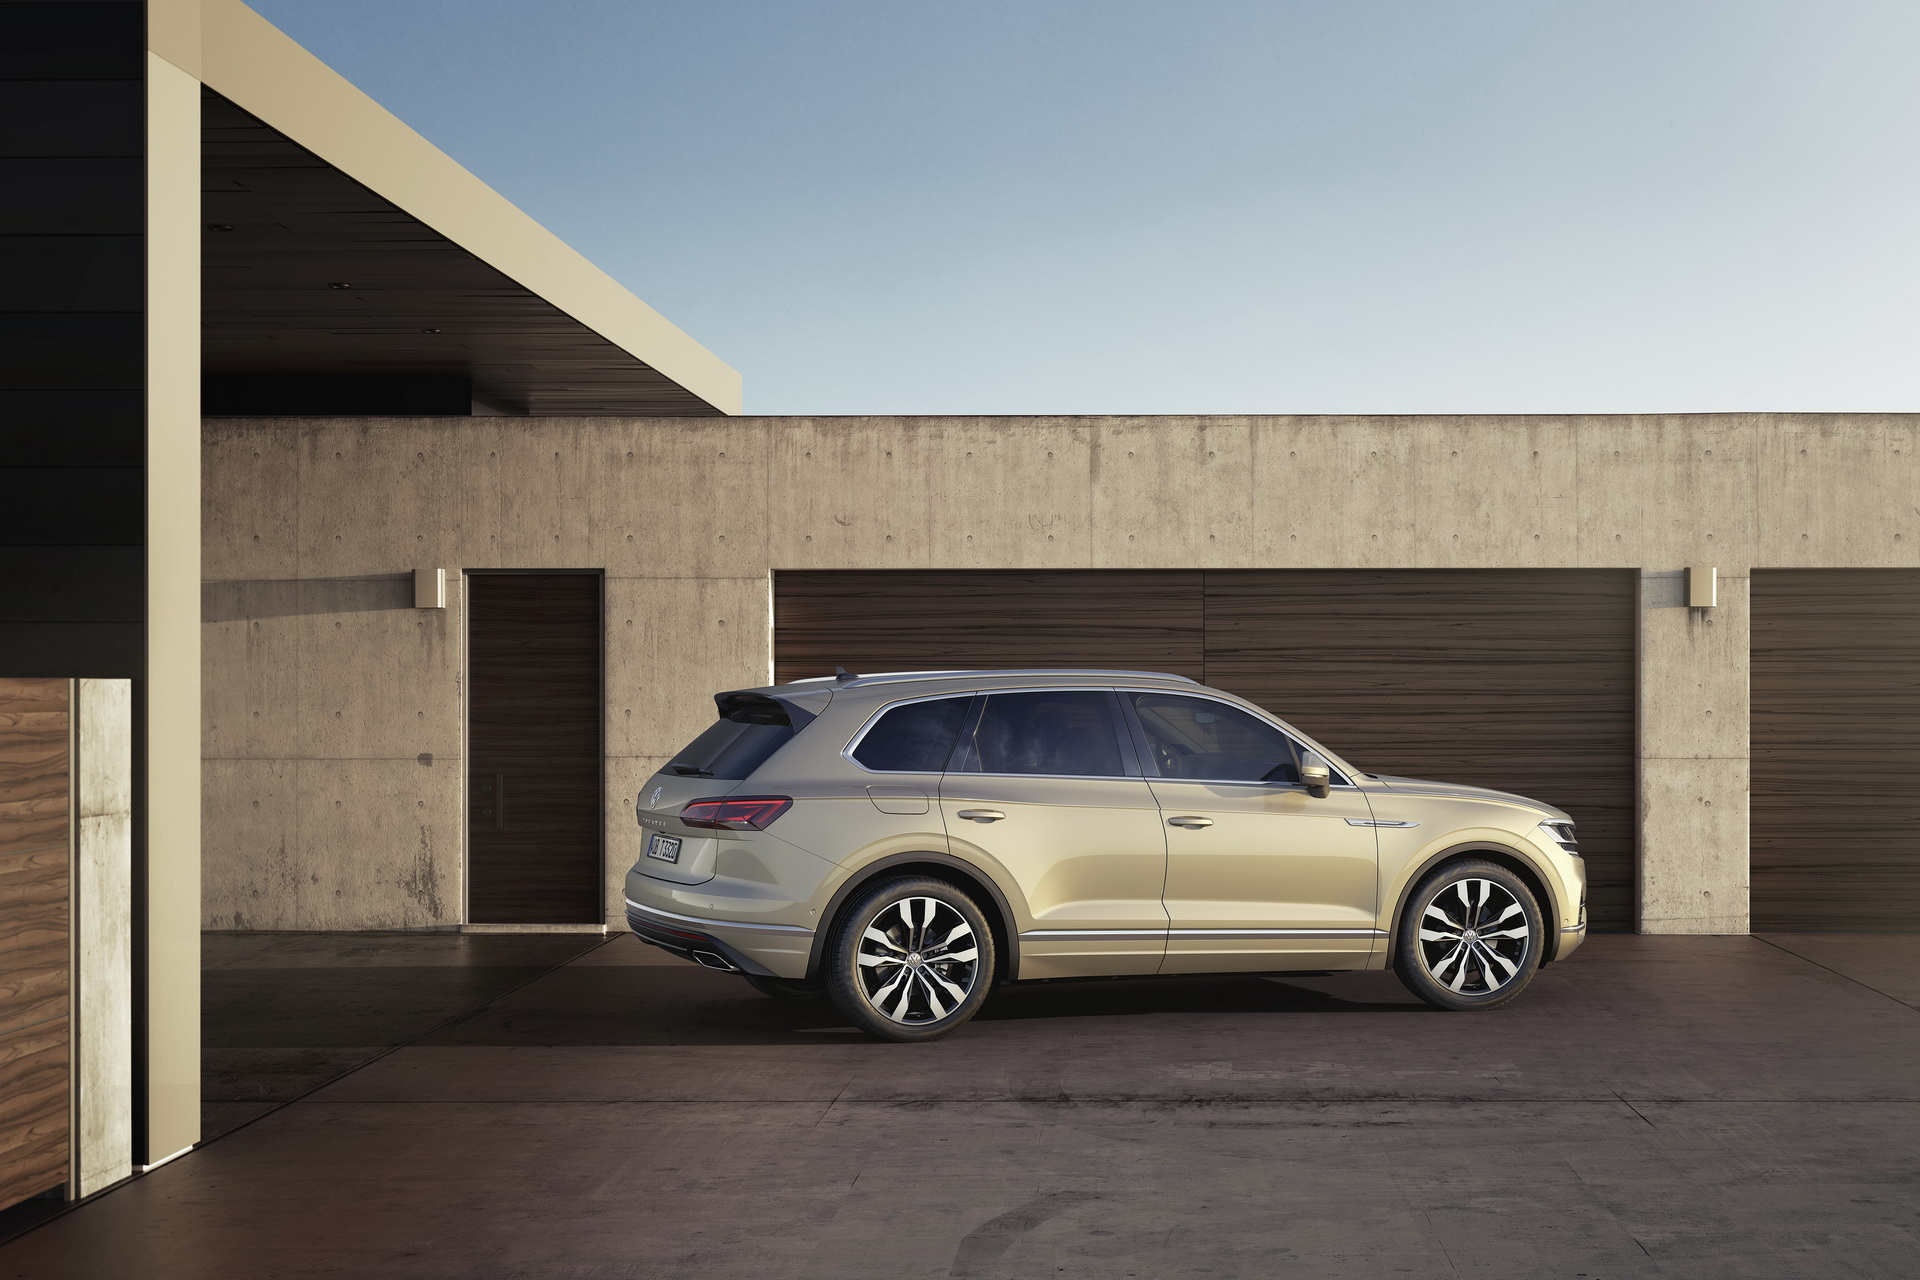 Volkswagen Touareg 2018 (3)